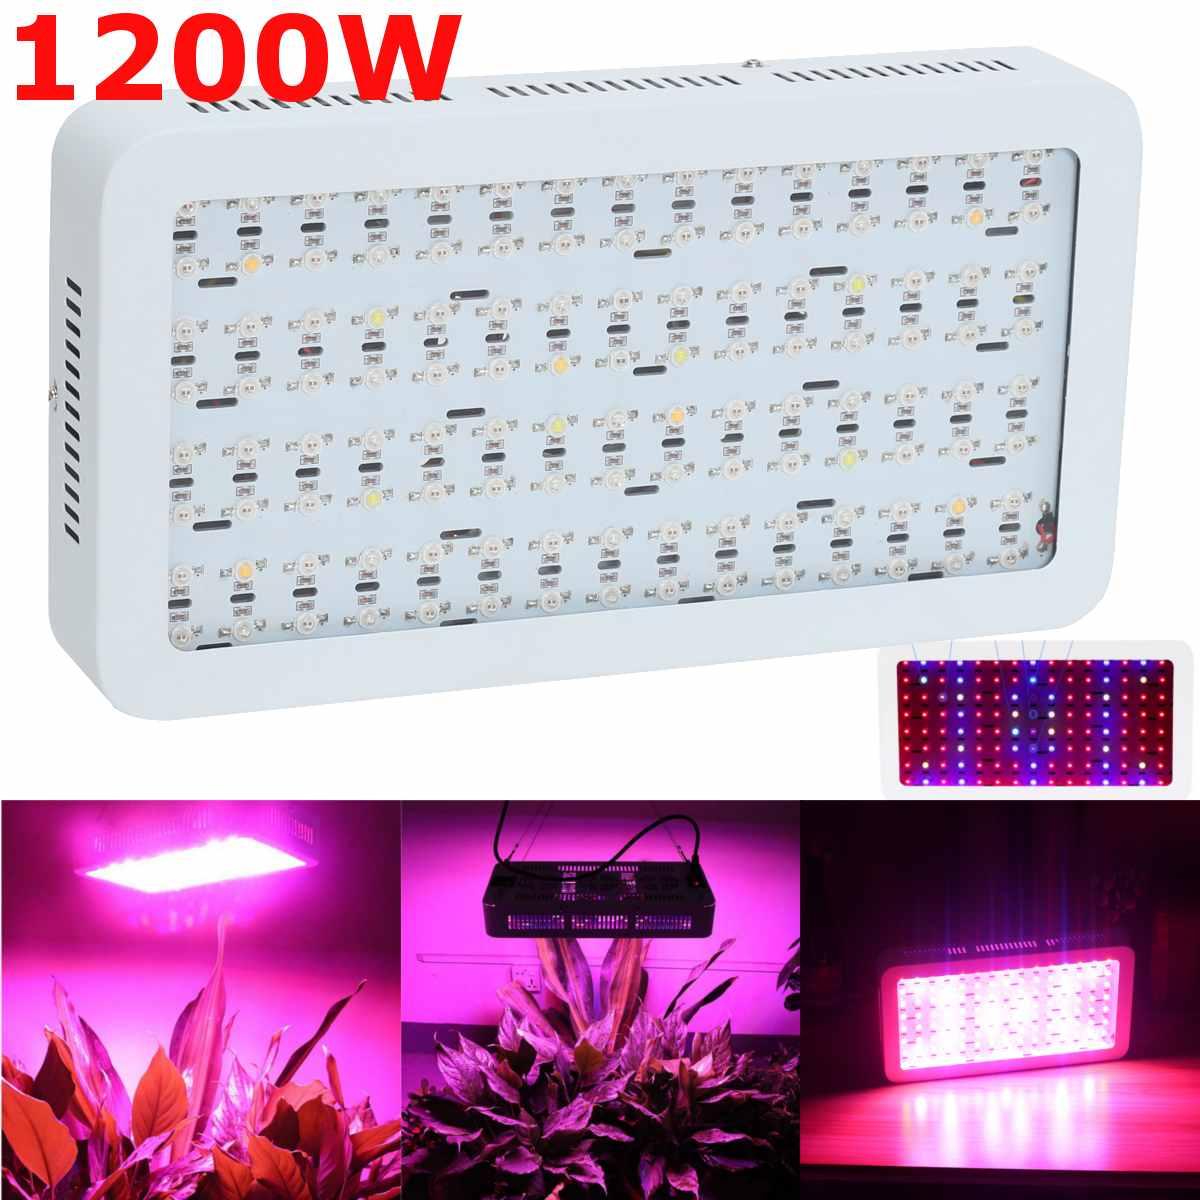 1200W 120Pcs LED Full Spectrum Hydroponic LED Grow Light Lamp For Plants Veg Bloom Fruit